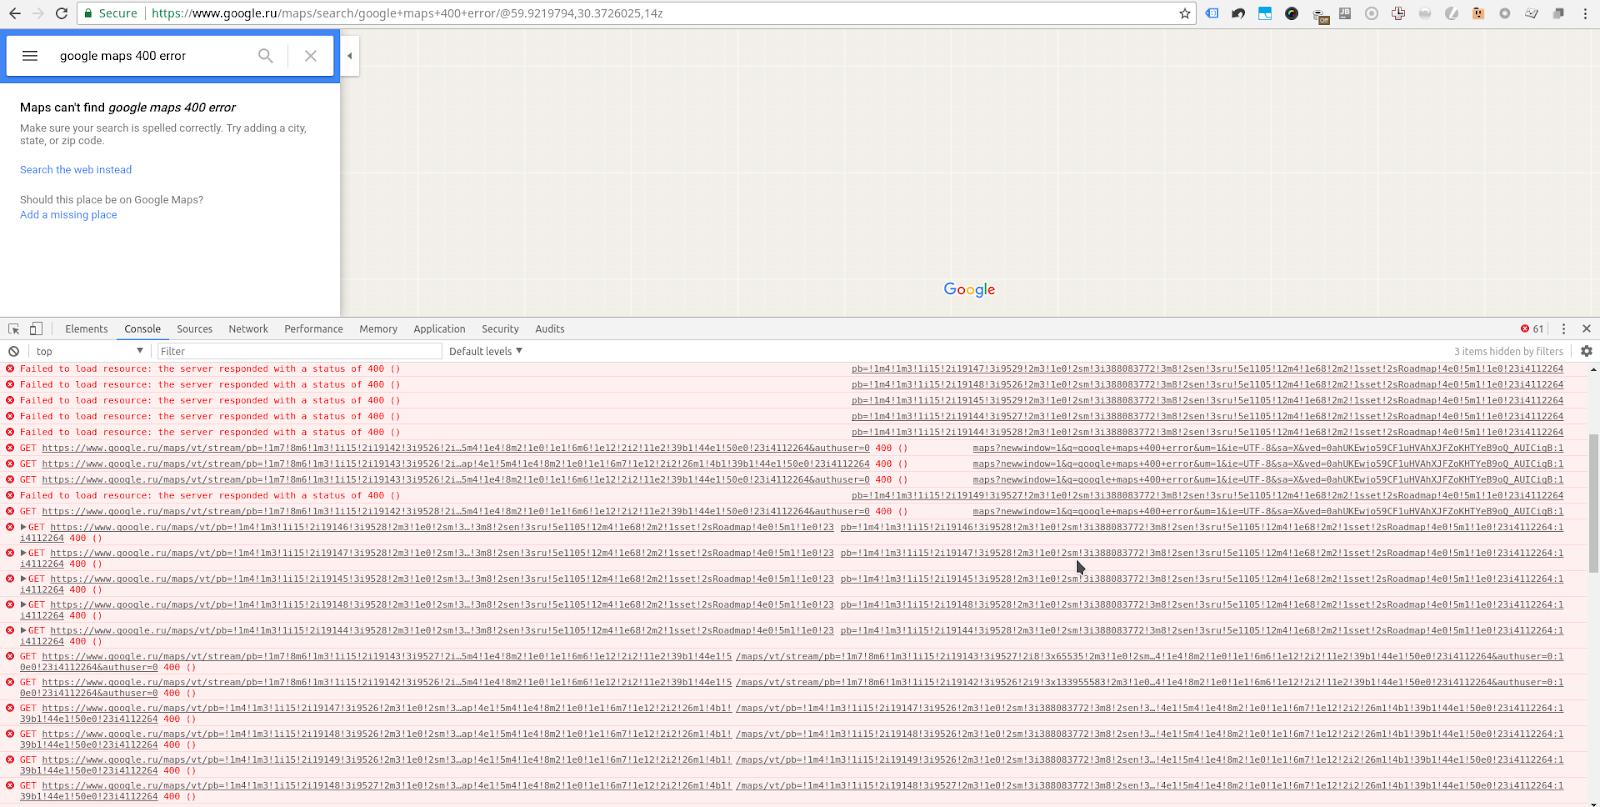 400 error in google maps - Google Maps Help